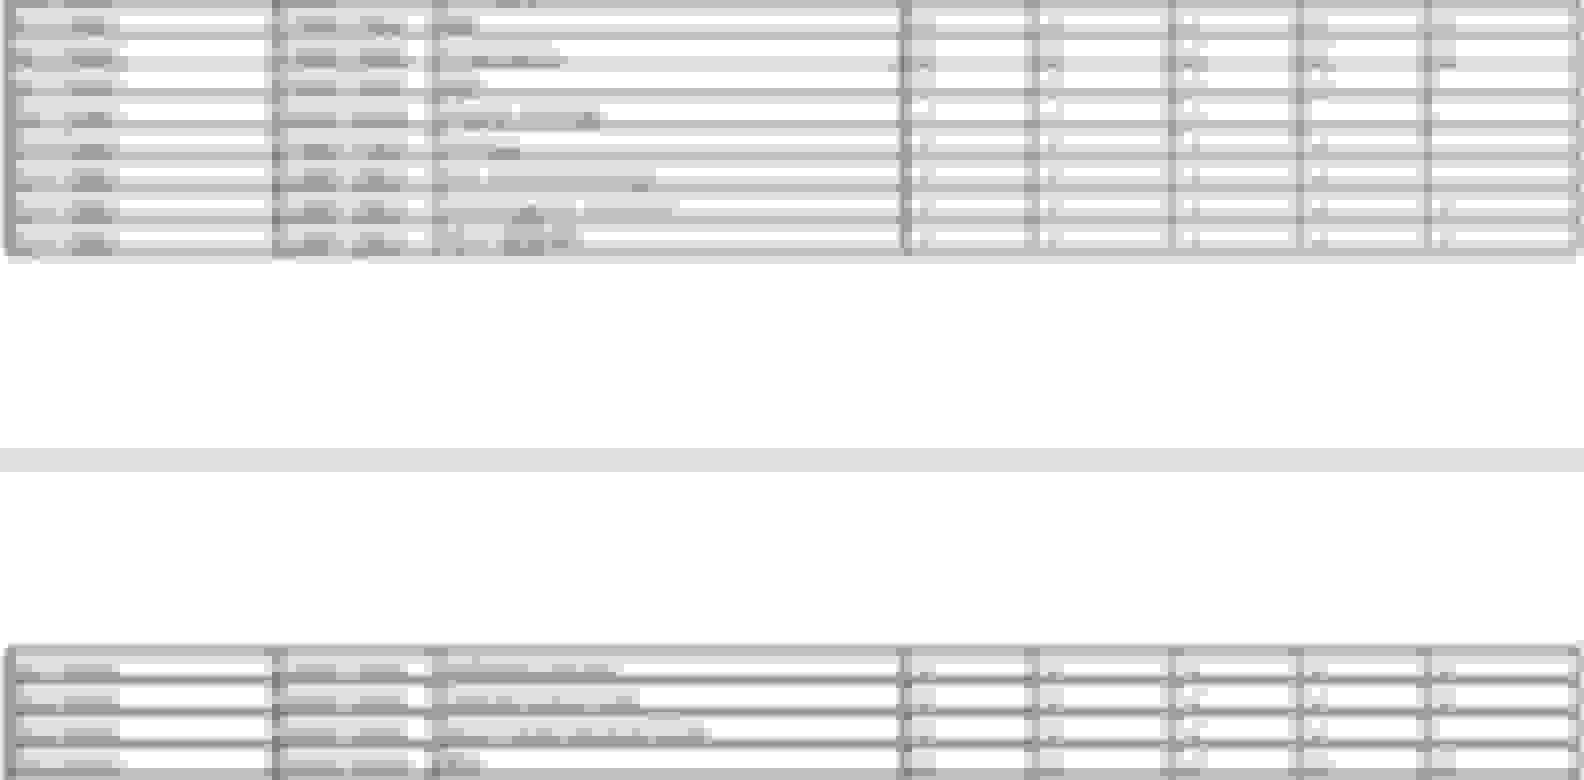 Foxwell Nt510, NT520 or something else? - Rennlist - Porsche